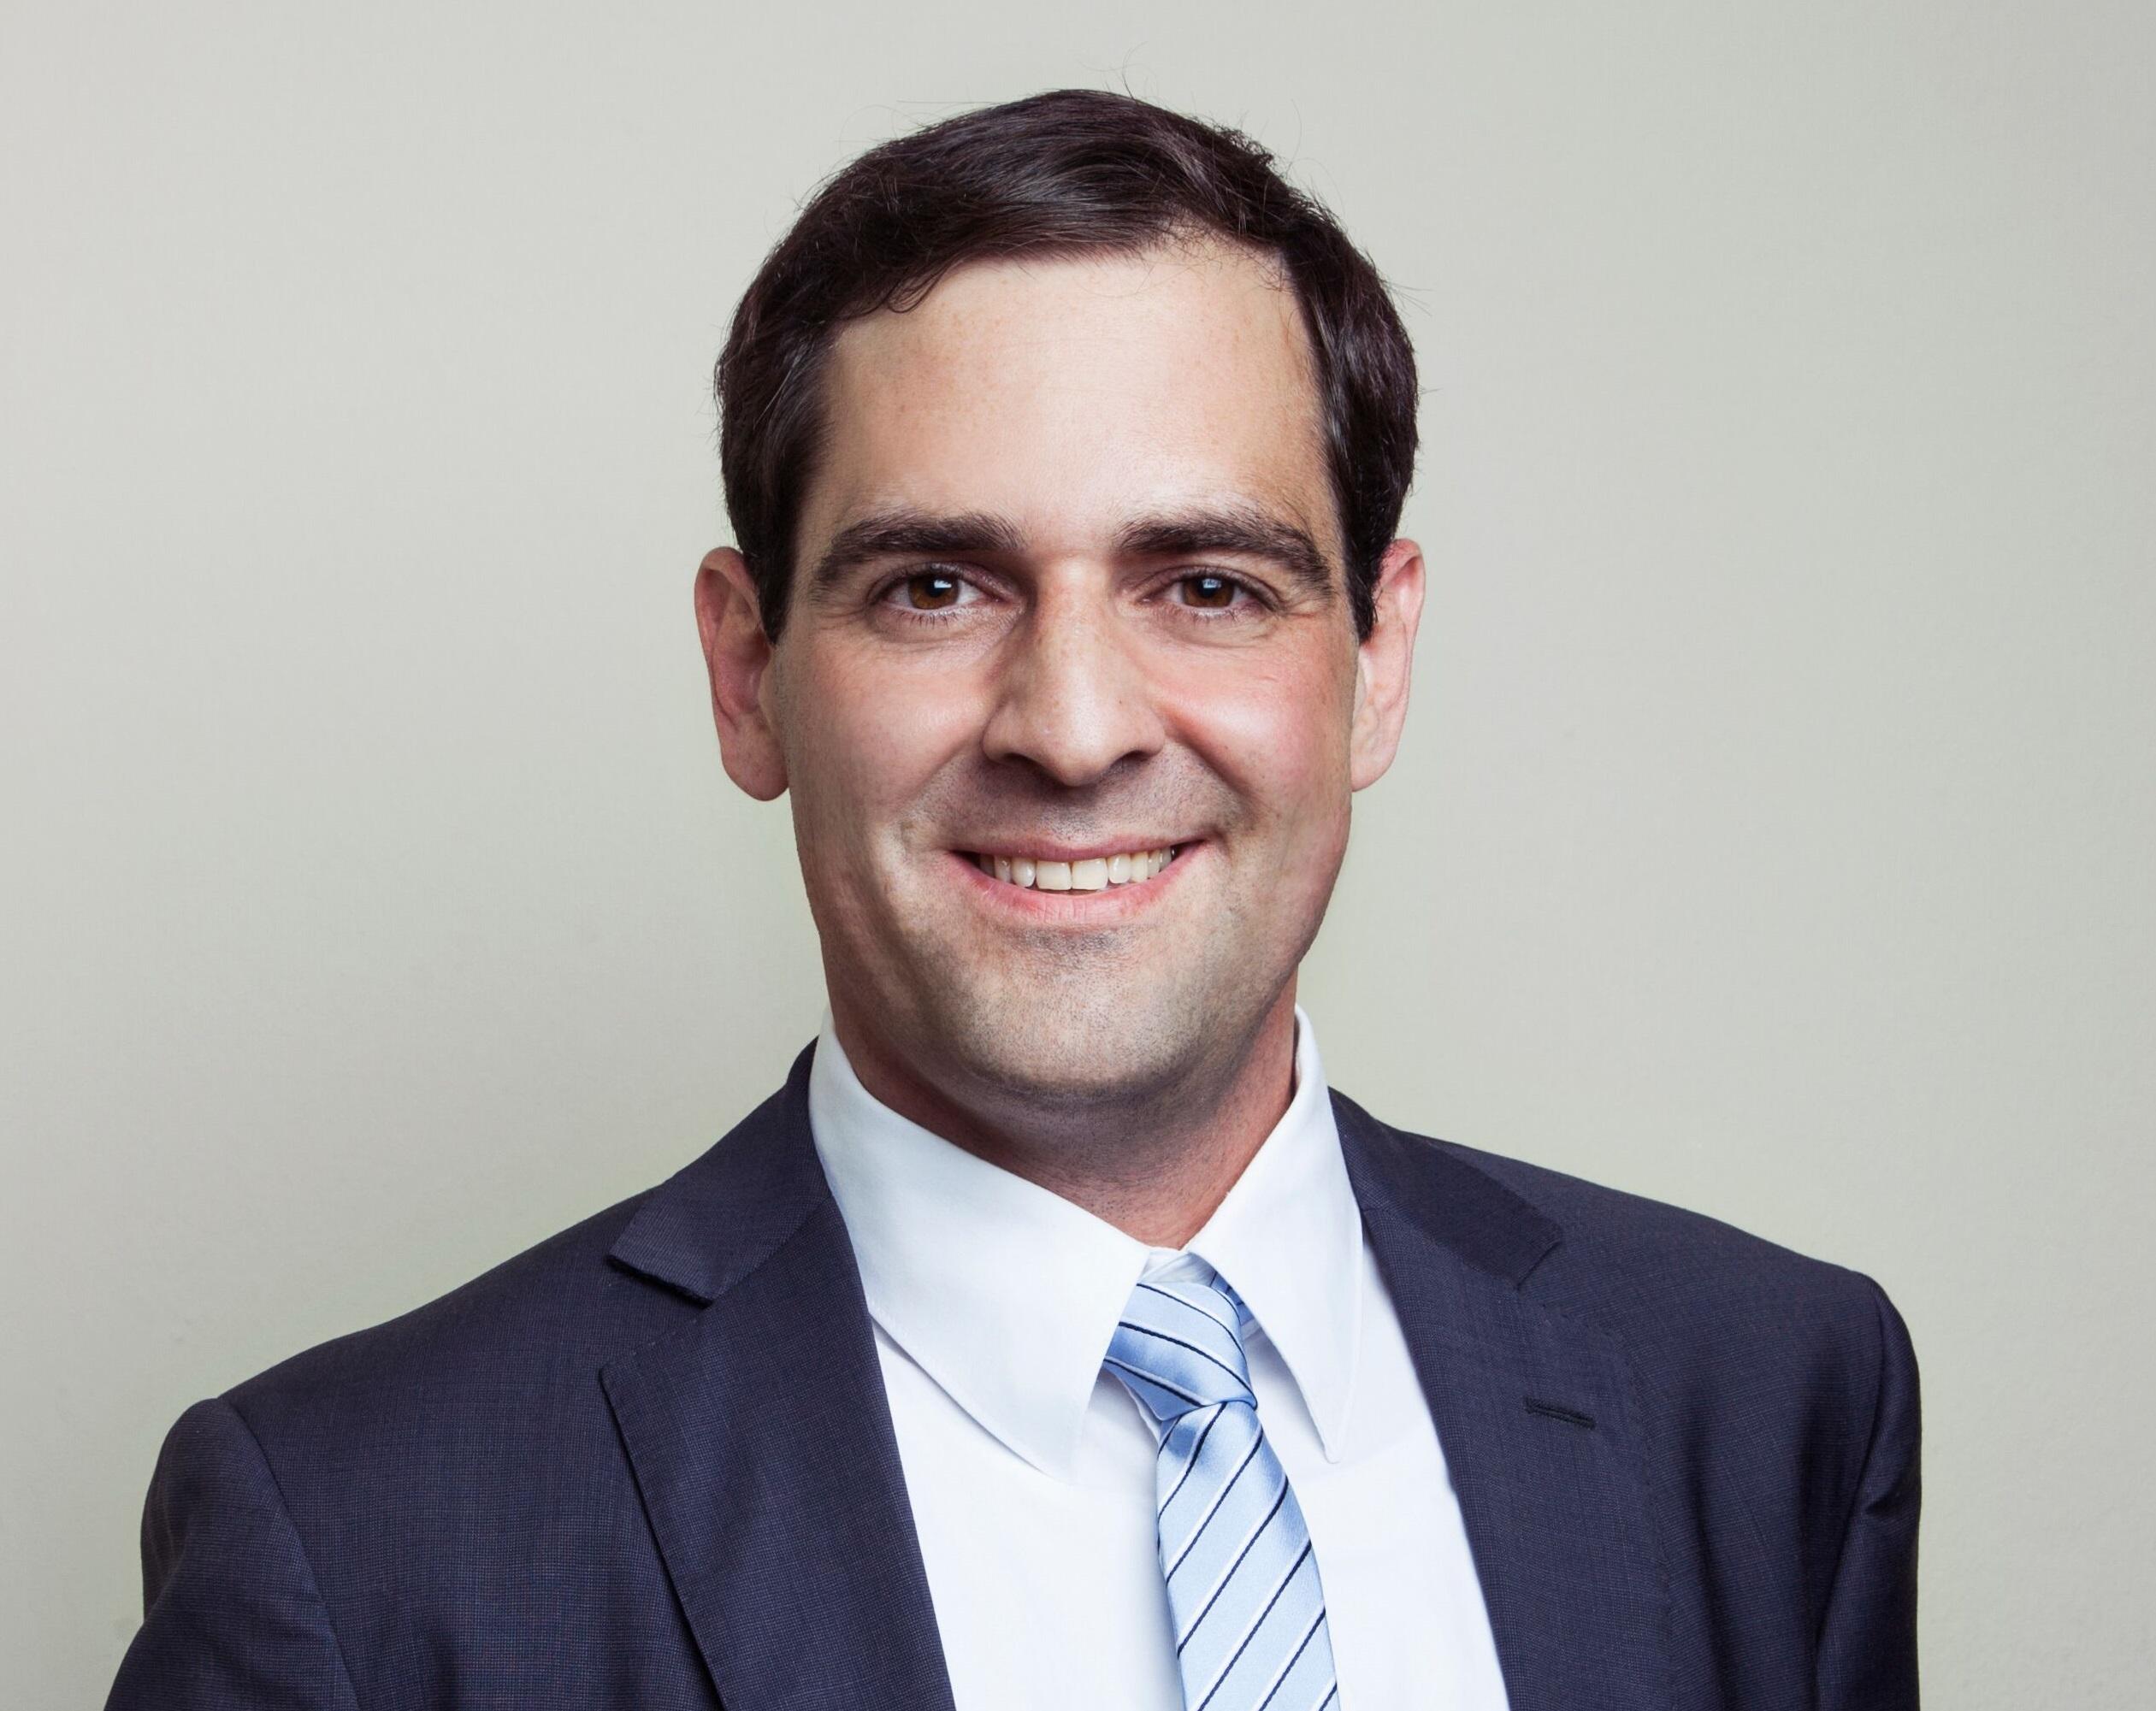 Aug 2018 – Prominent Seminar 2018 In Rotterdam – Interview With Dr. Alain Graf Of Südzucker